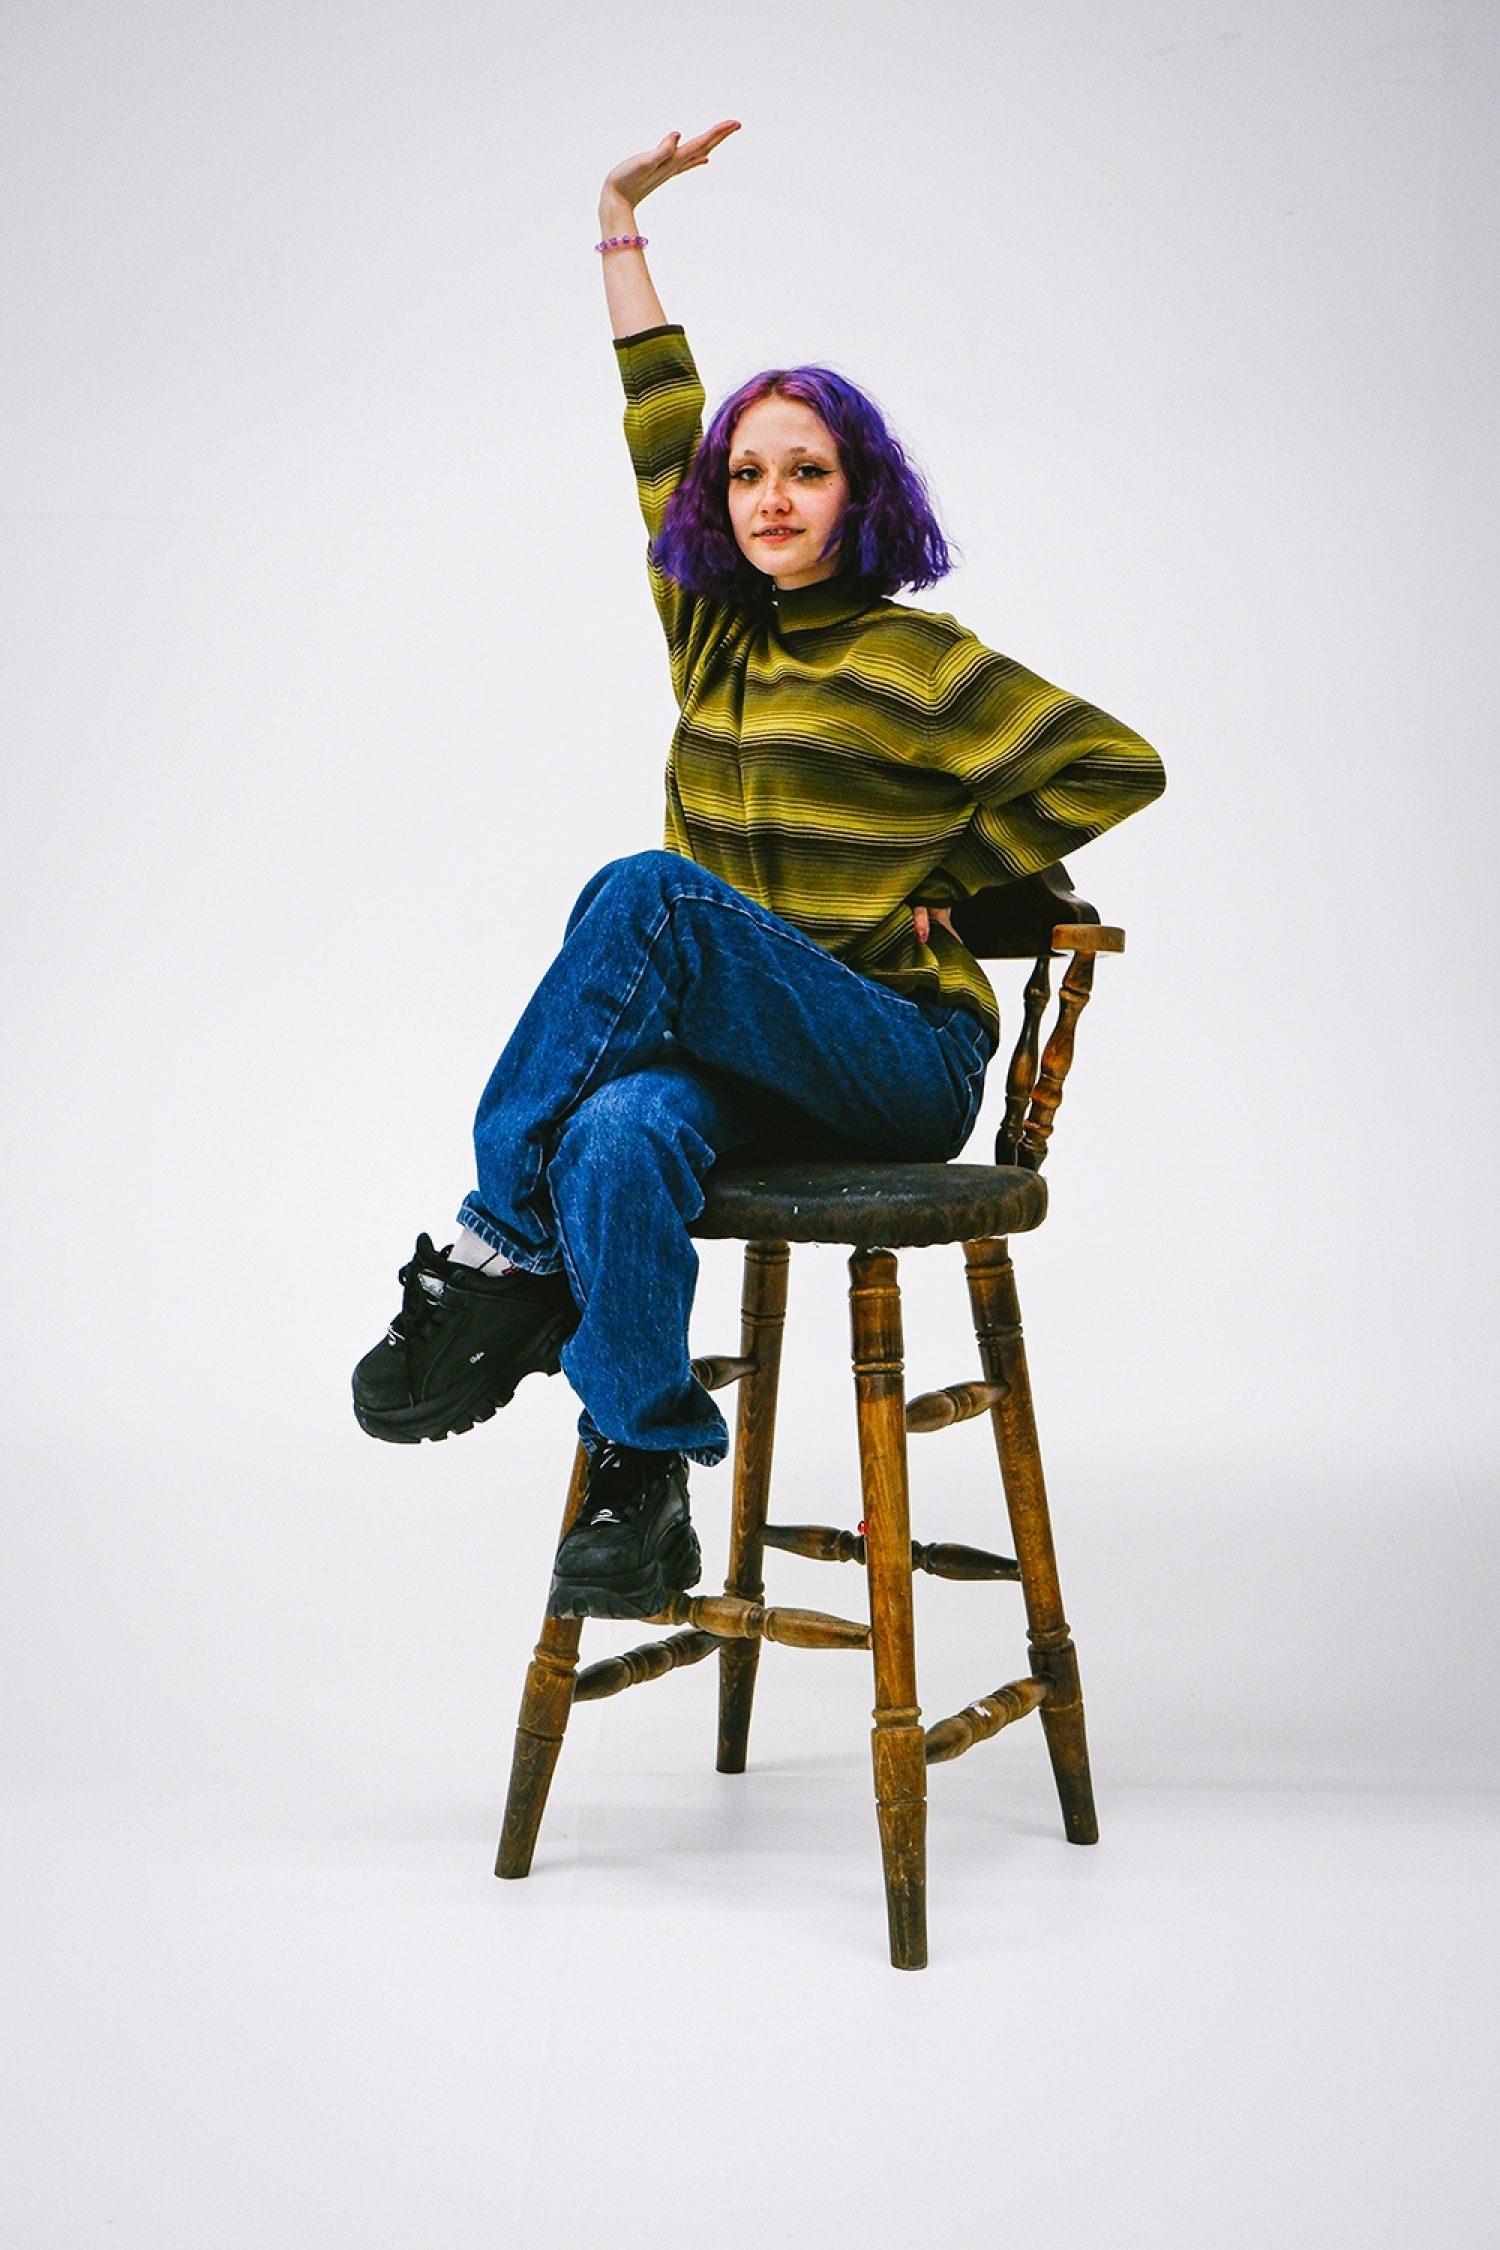 Chloe Moriondo: Bring it on